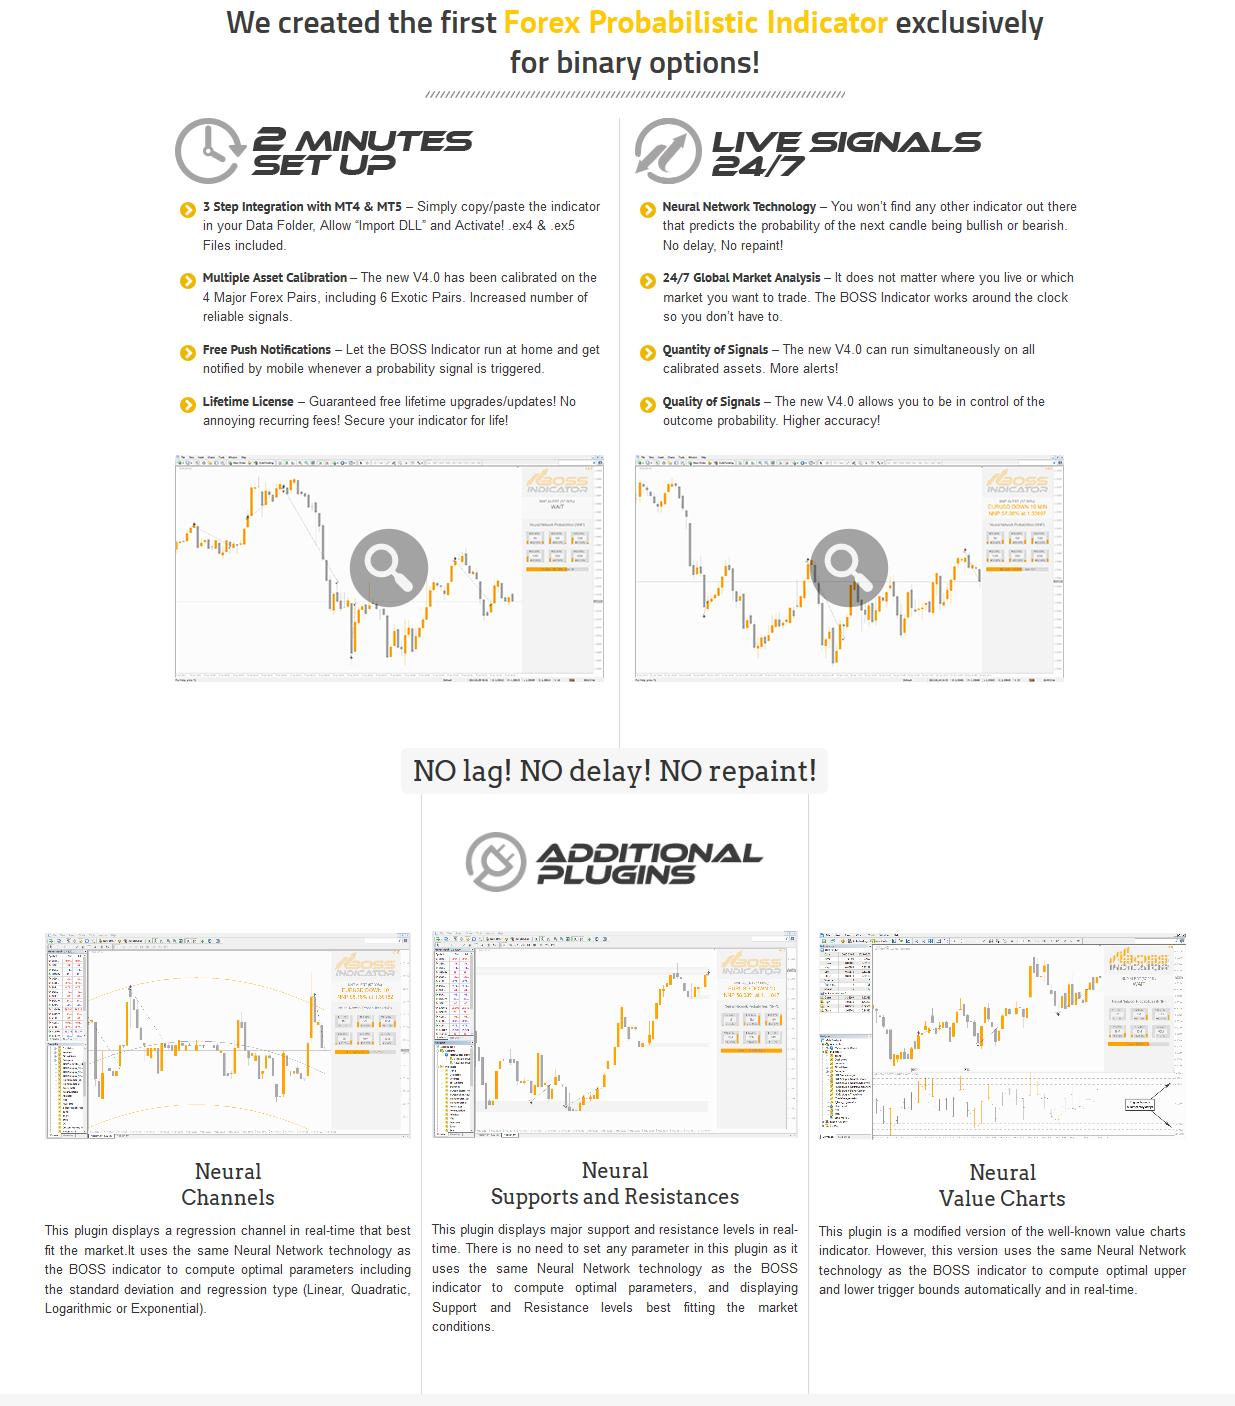 Boss indicator binary Option Plus Market Profile - Steidlmayer - Volume Strips(Enjoy Free BONUS -Greg Shrader)